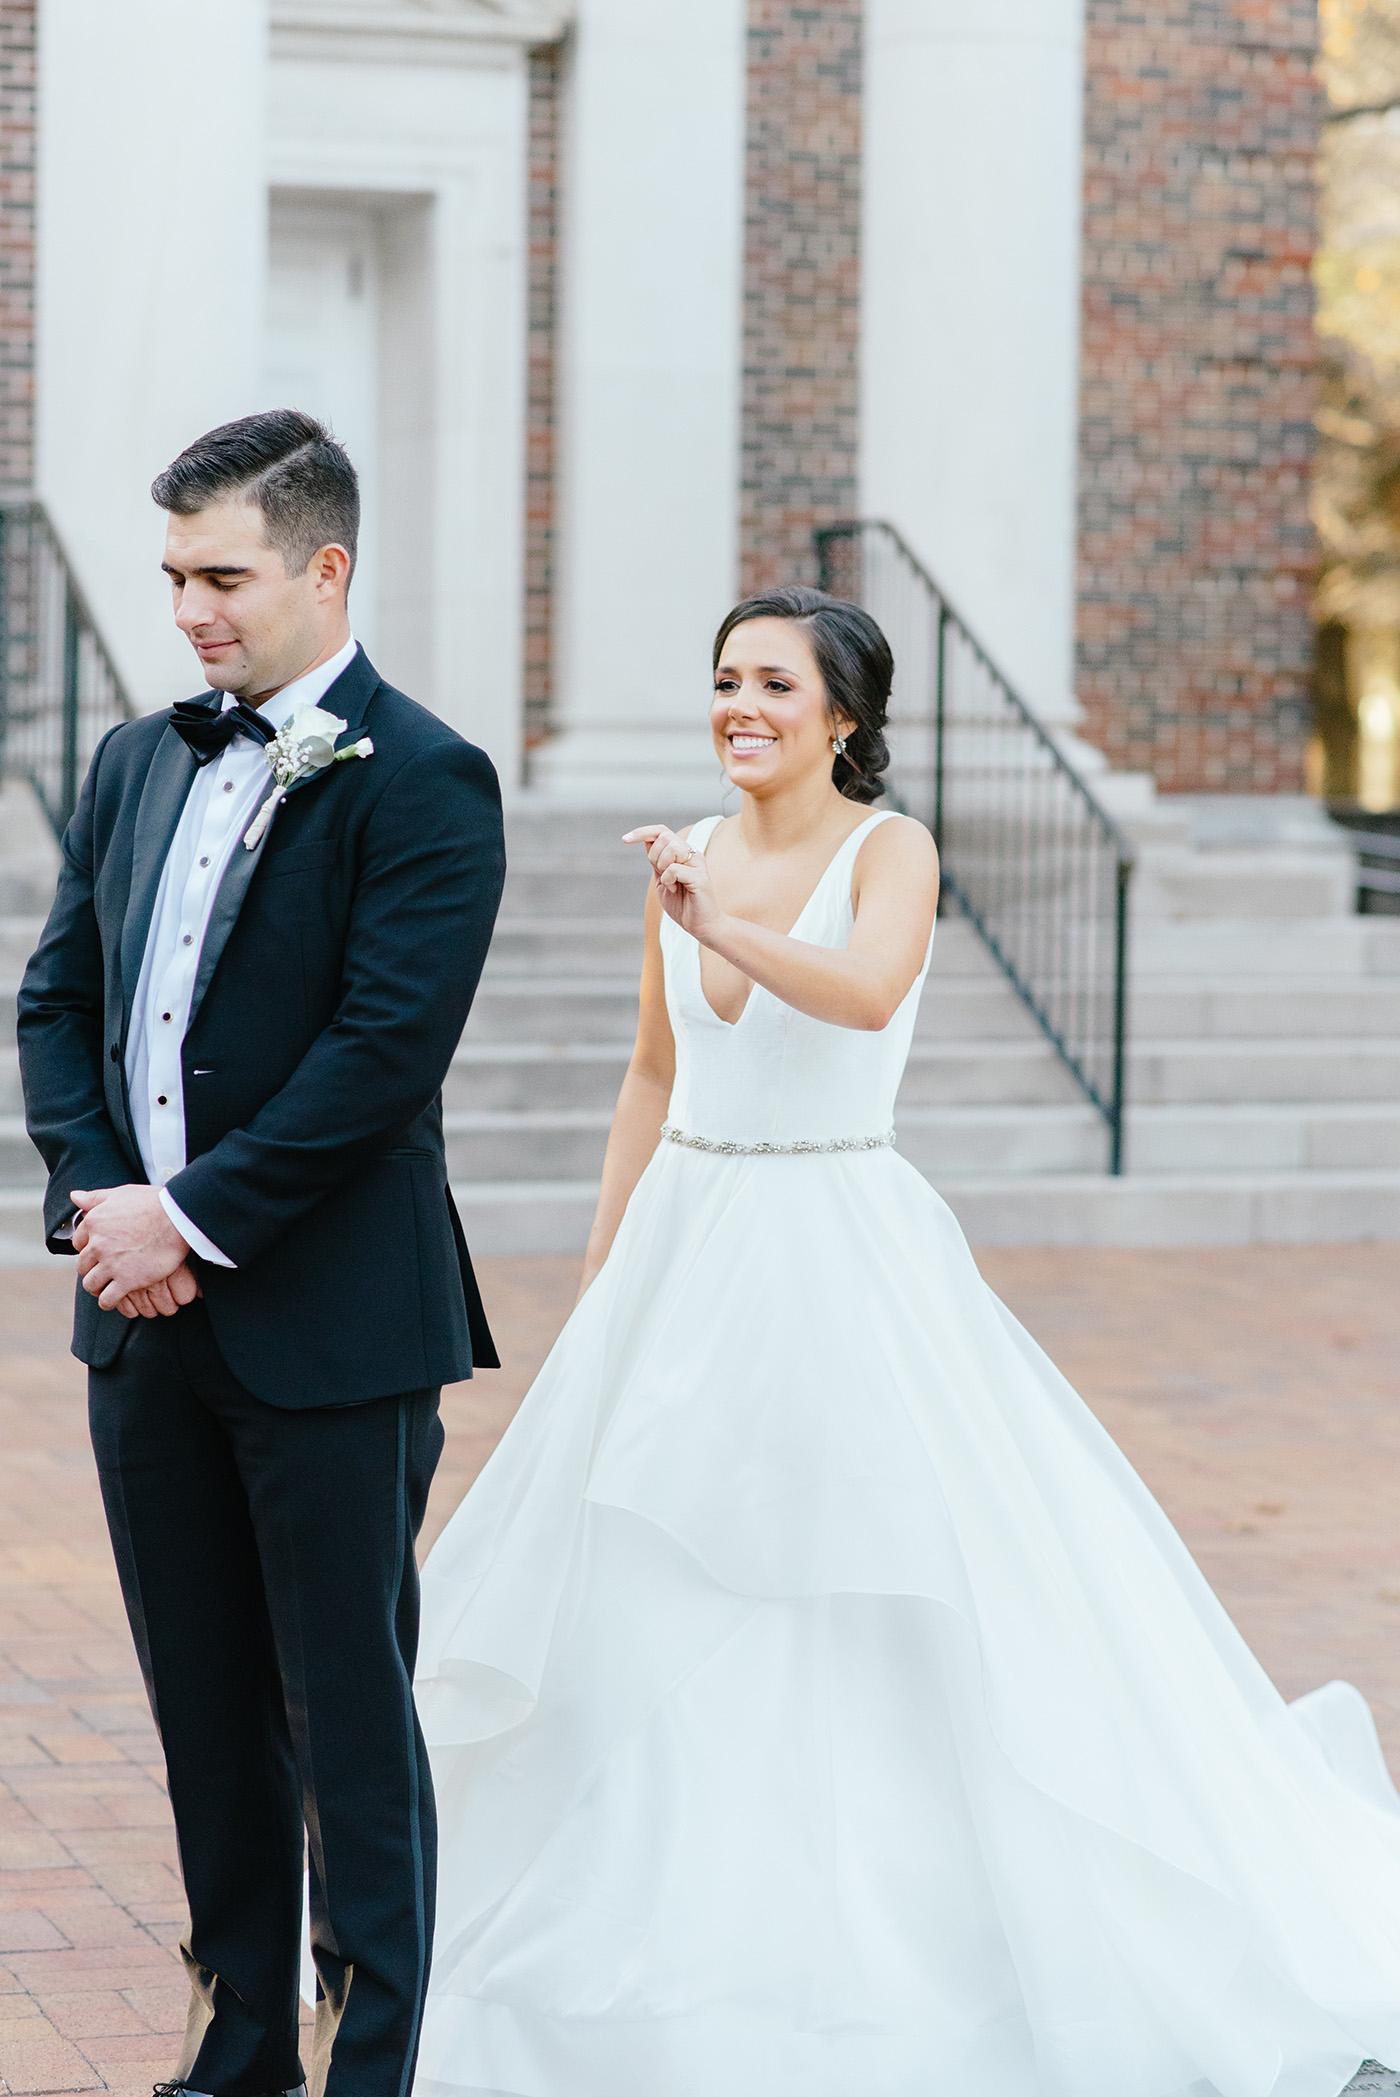 Dallas Wedding Planner - Winter Wedding at The Room on Main - Allday Events - 103.jpg